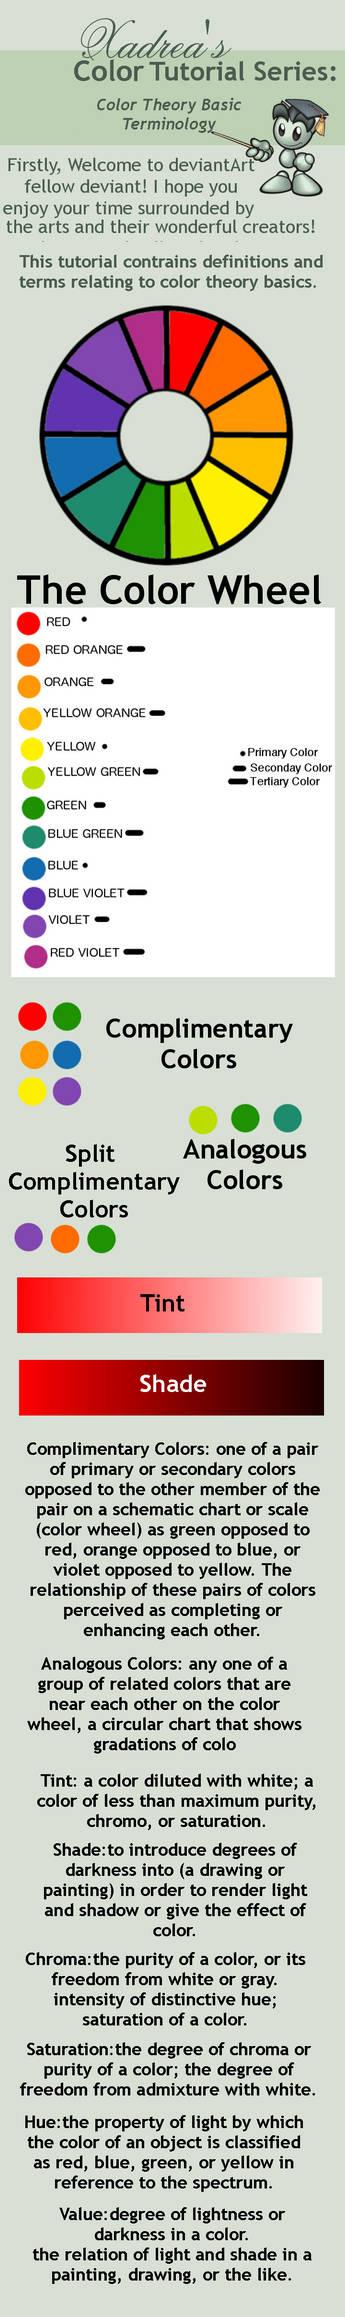 Color Tutorial Series: Basic Terminology